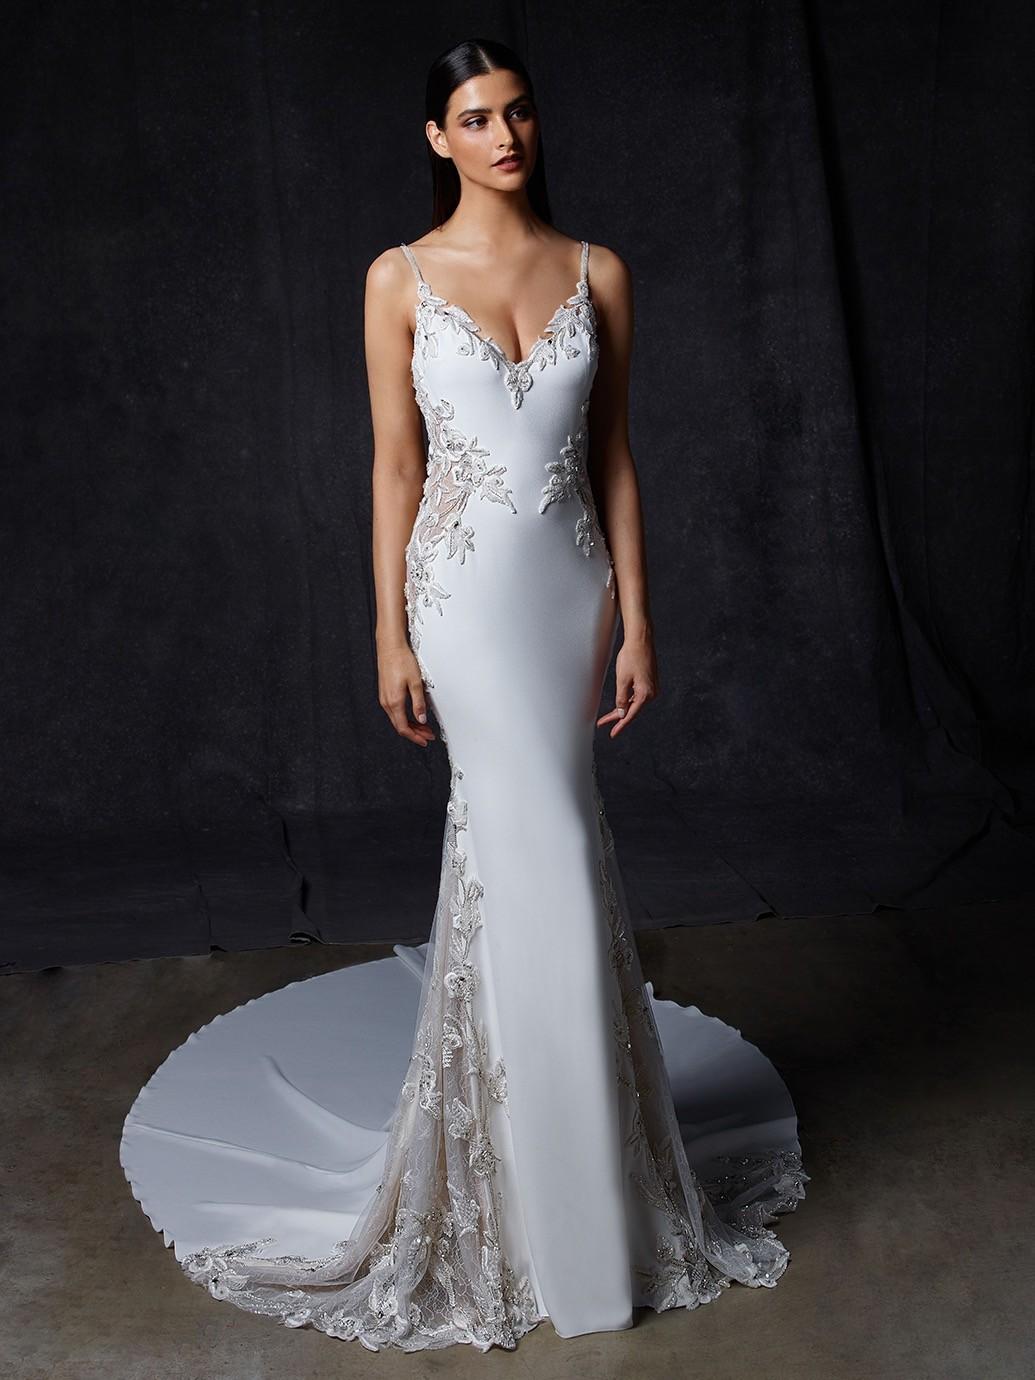 Brautkleid Modell Ozara aus der Enzoani Kollektion 2020